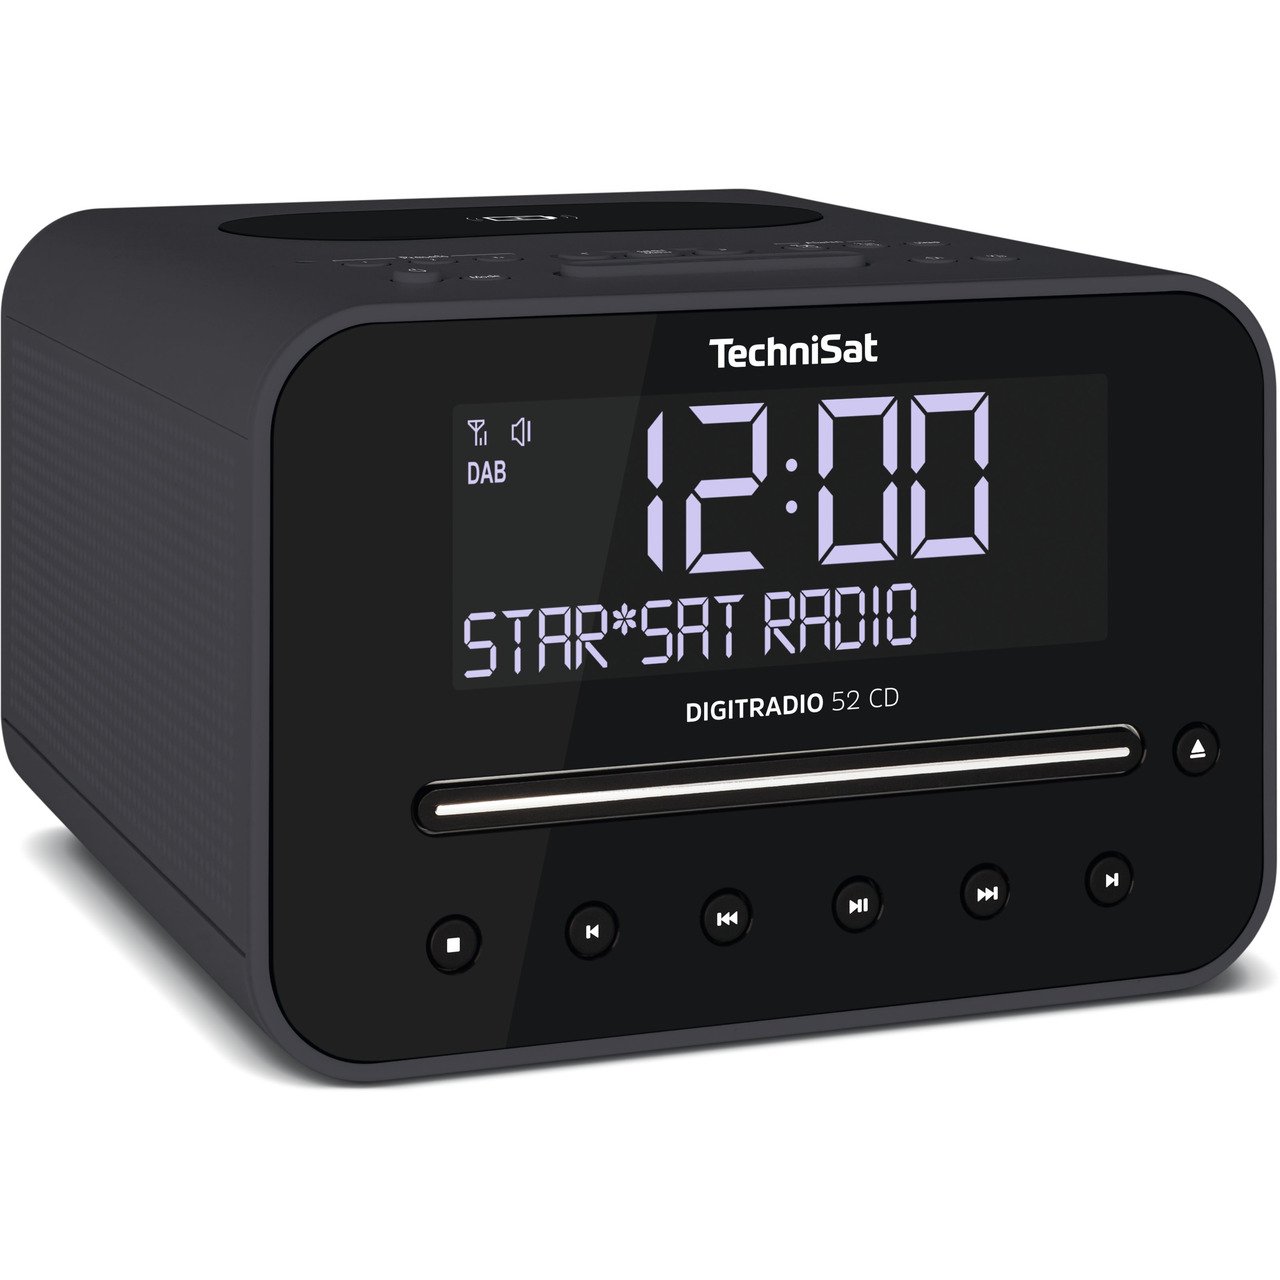 TechniSat DigitRadio 52 CD- mit DAB+/UKW-Empfang- CD-Player und Bluetooth-Funktion